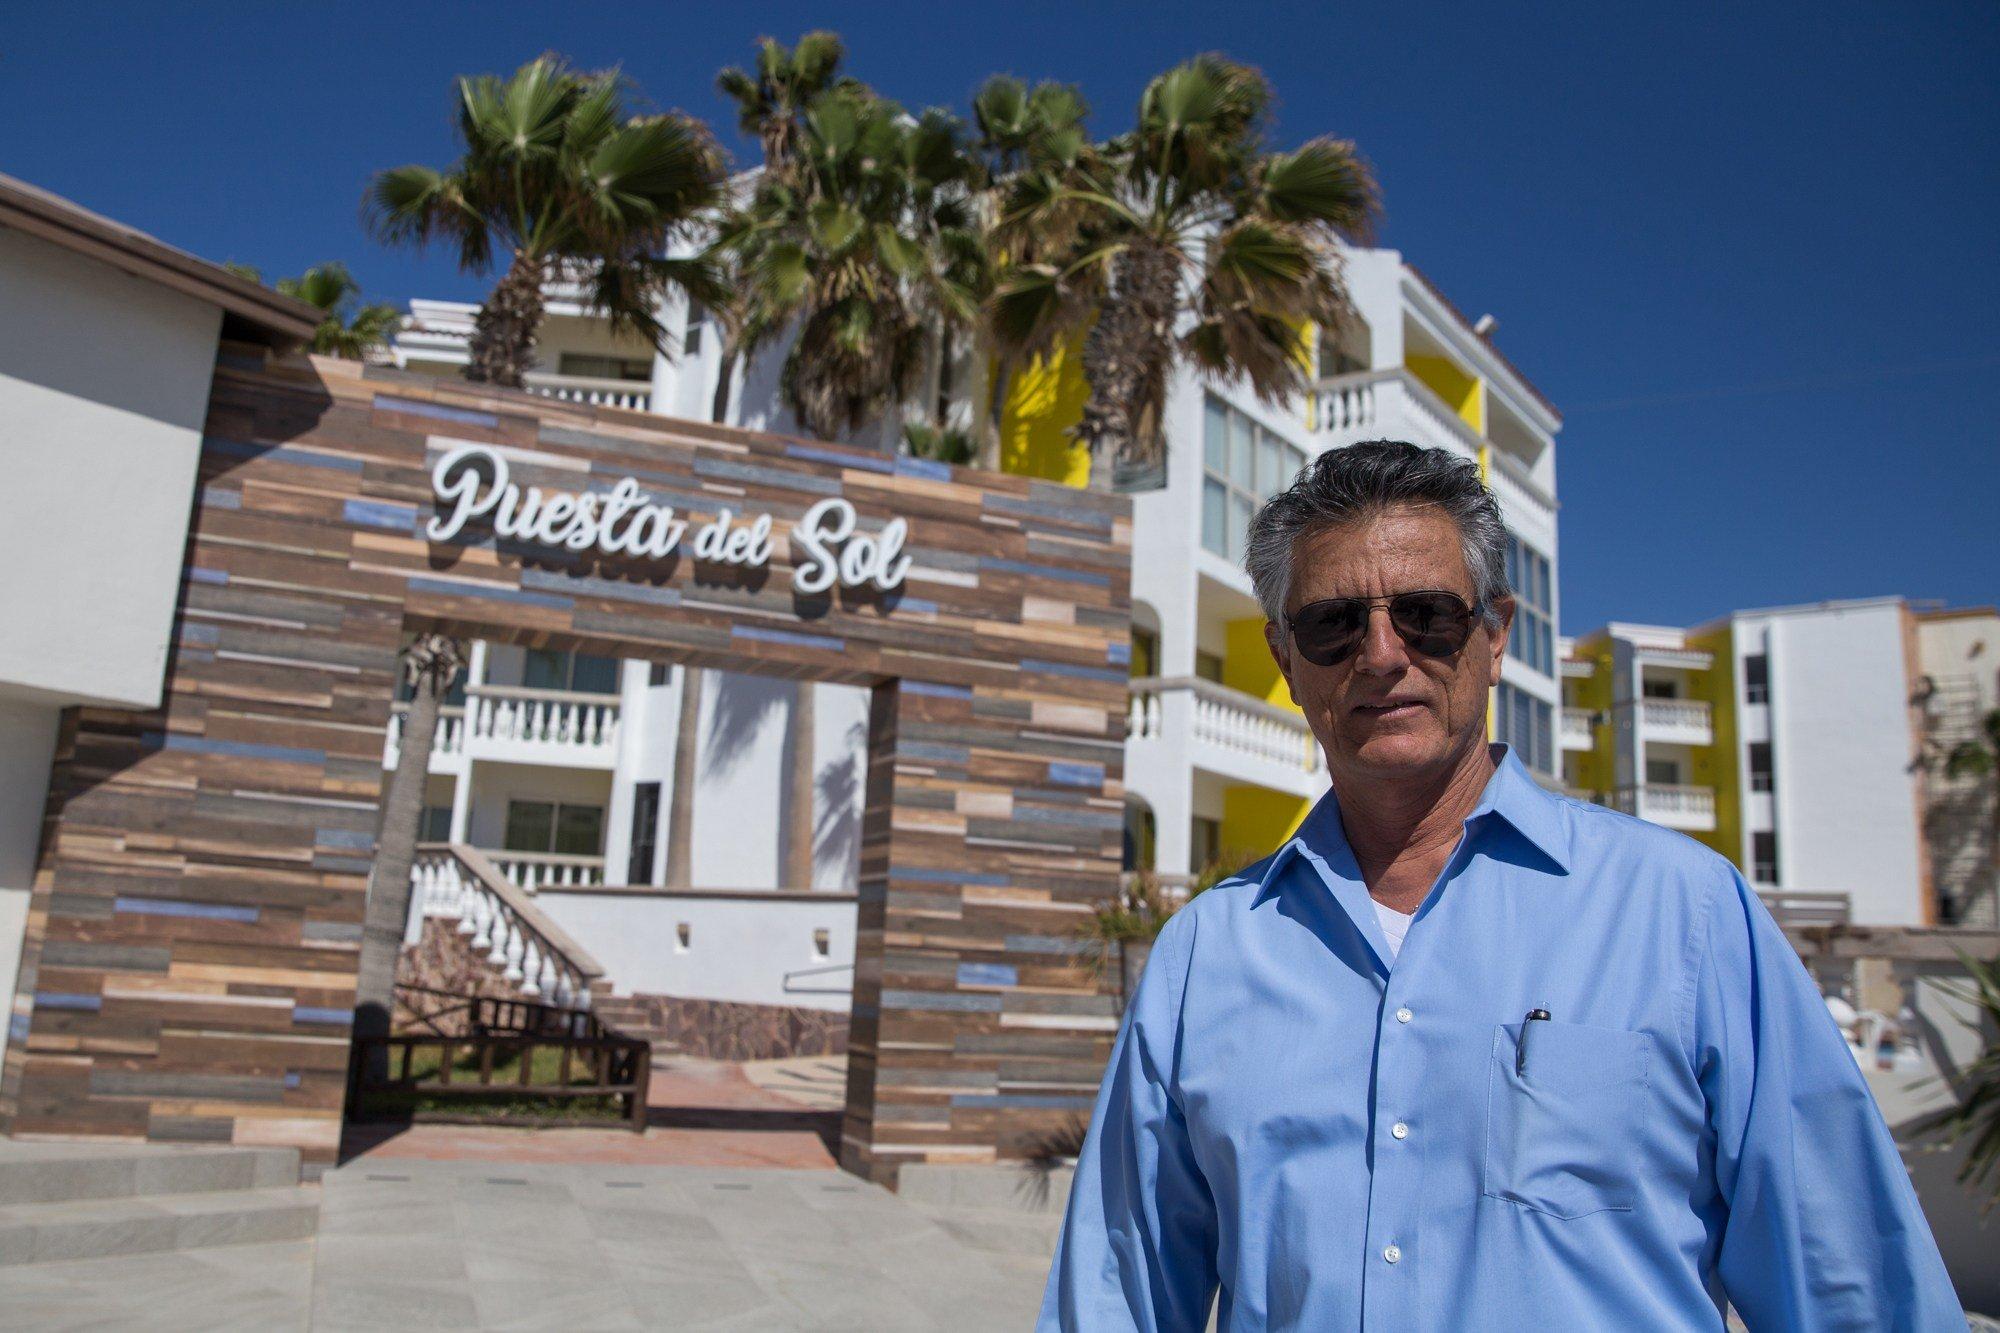 Oscar Palacio, owner of Playa Bonita Resort in Puerto Peñasco, said he believes more safety corridors should be implemented in Mexico. (Source: Angel Mendoza/Cronkite News)